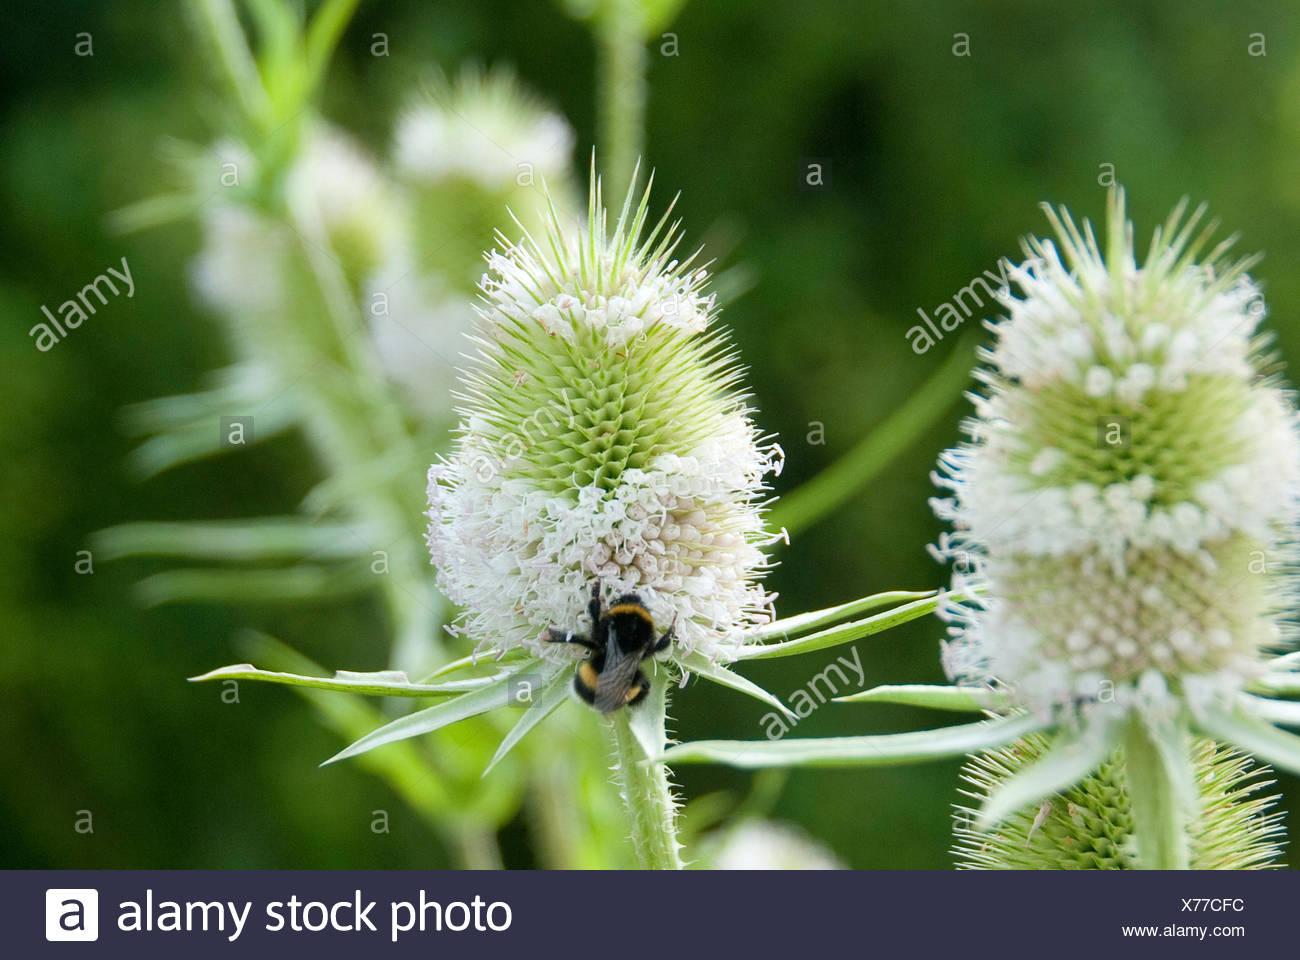 wild teasel, Fuller's teasel, common teasel, common teazle (Dipsacus fullonum, Dipsacus sylvestris), inflorescence mit humble bee, Germany - Stock Image